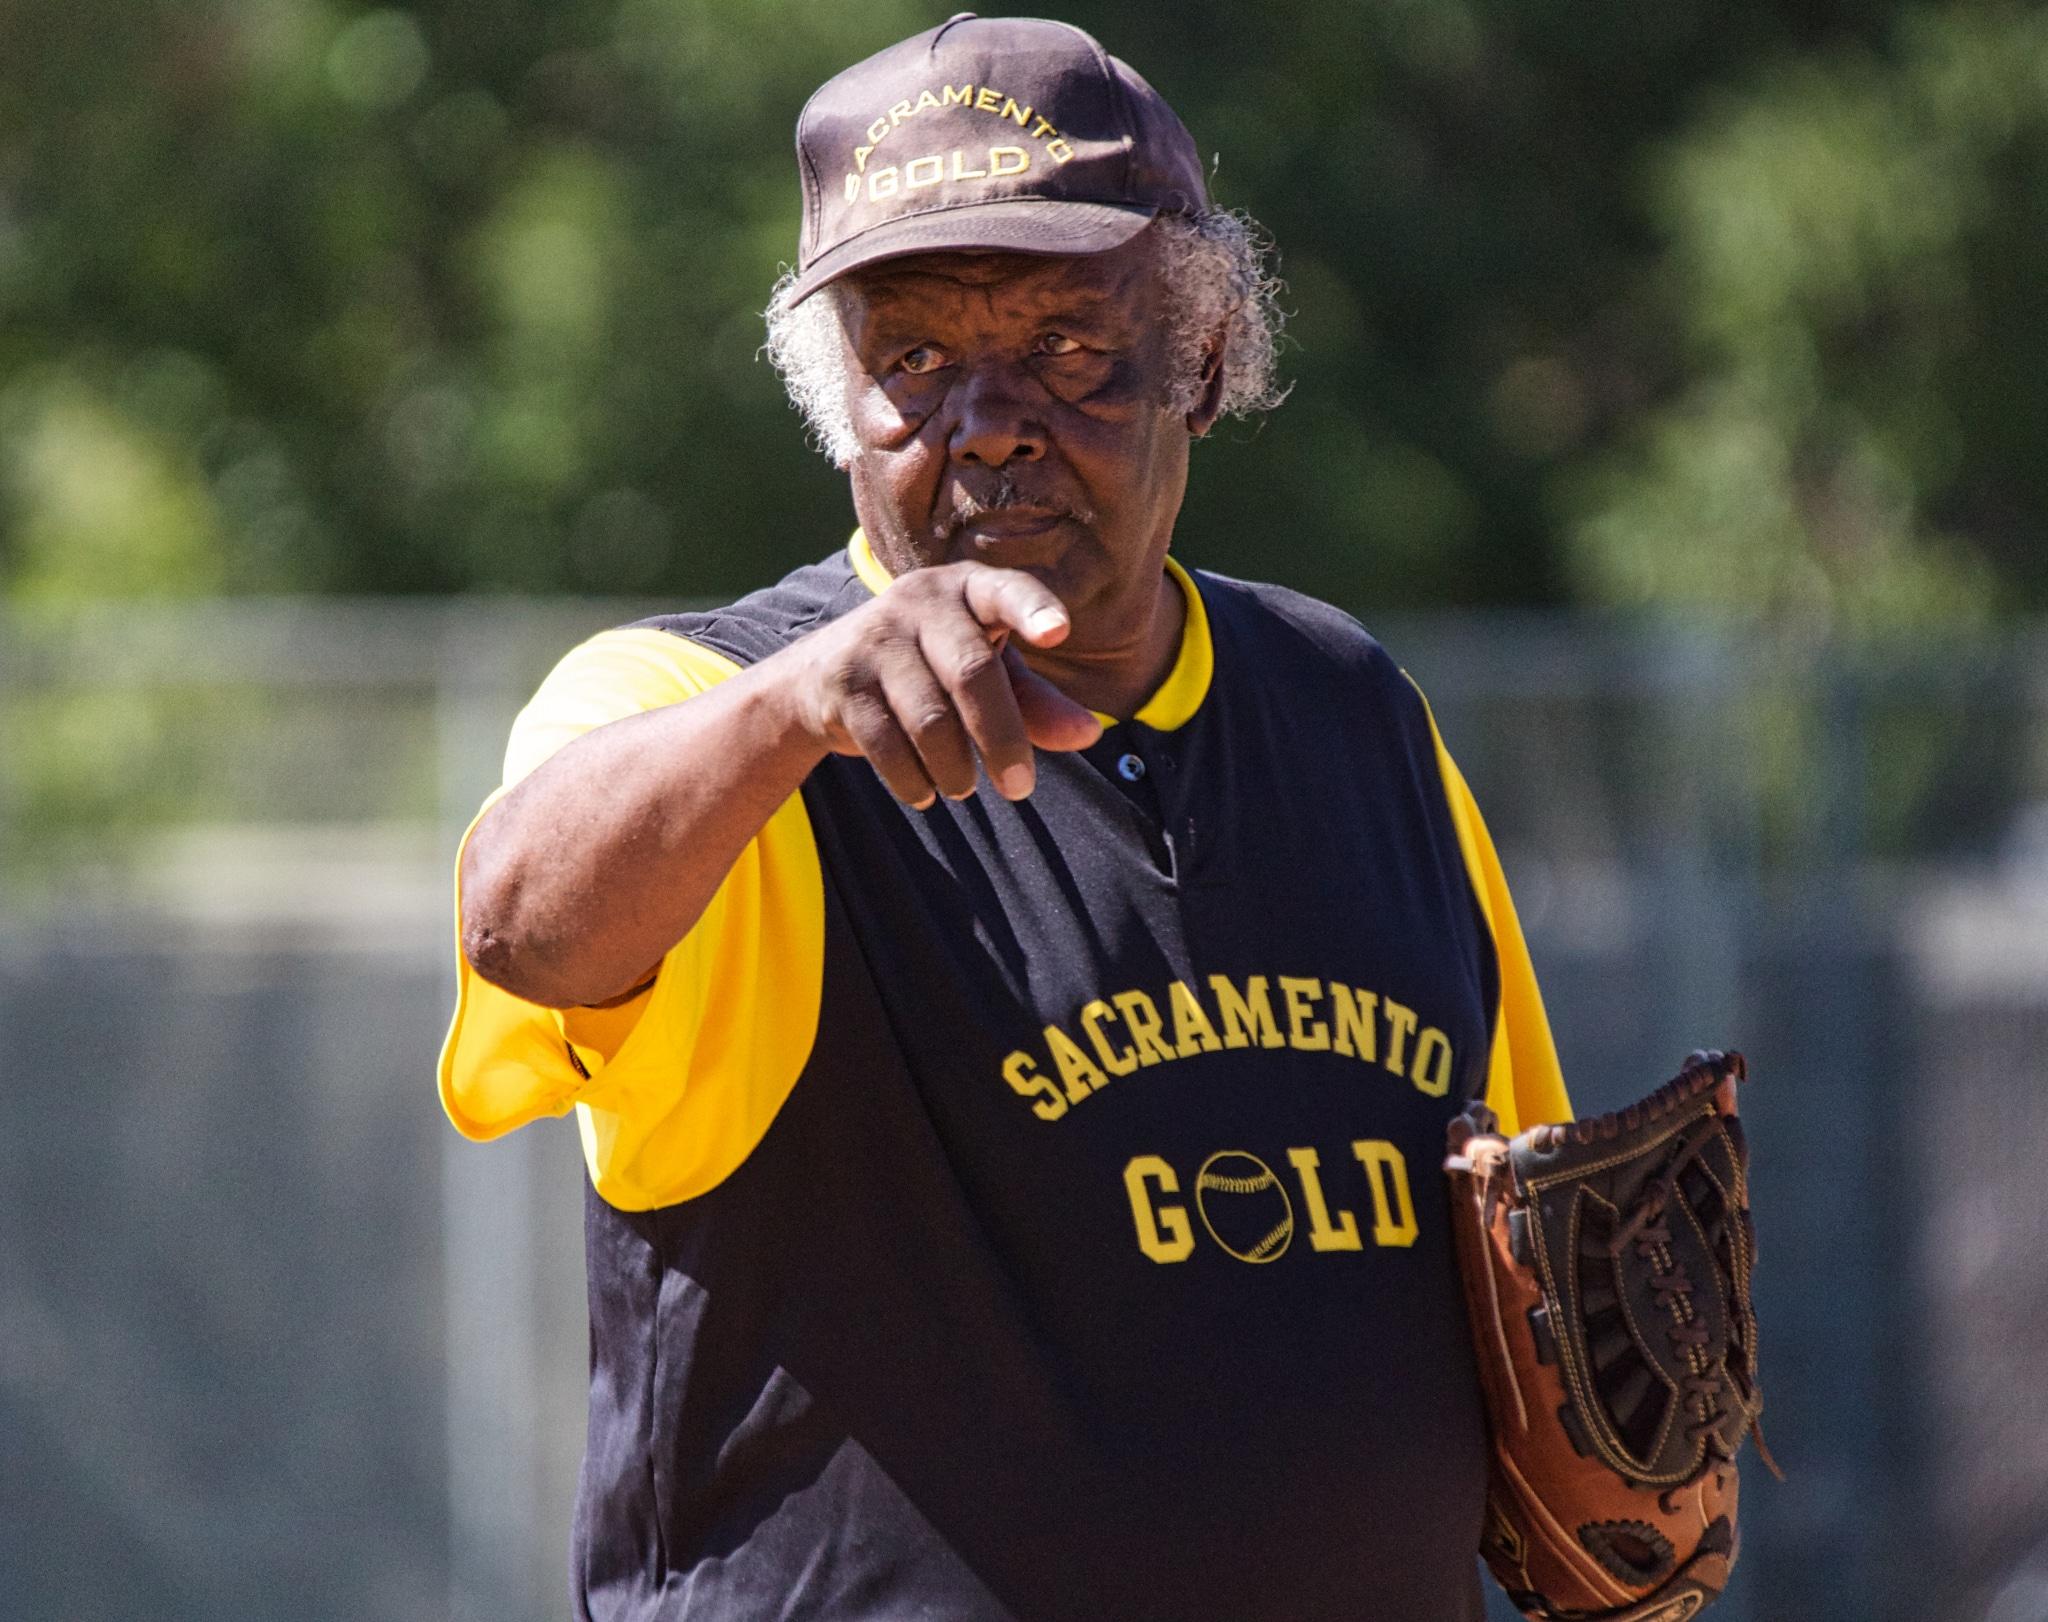 Sacramento Gold Players Still Going Strong in Their 80s via @sacramentopress